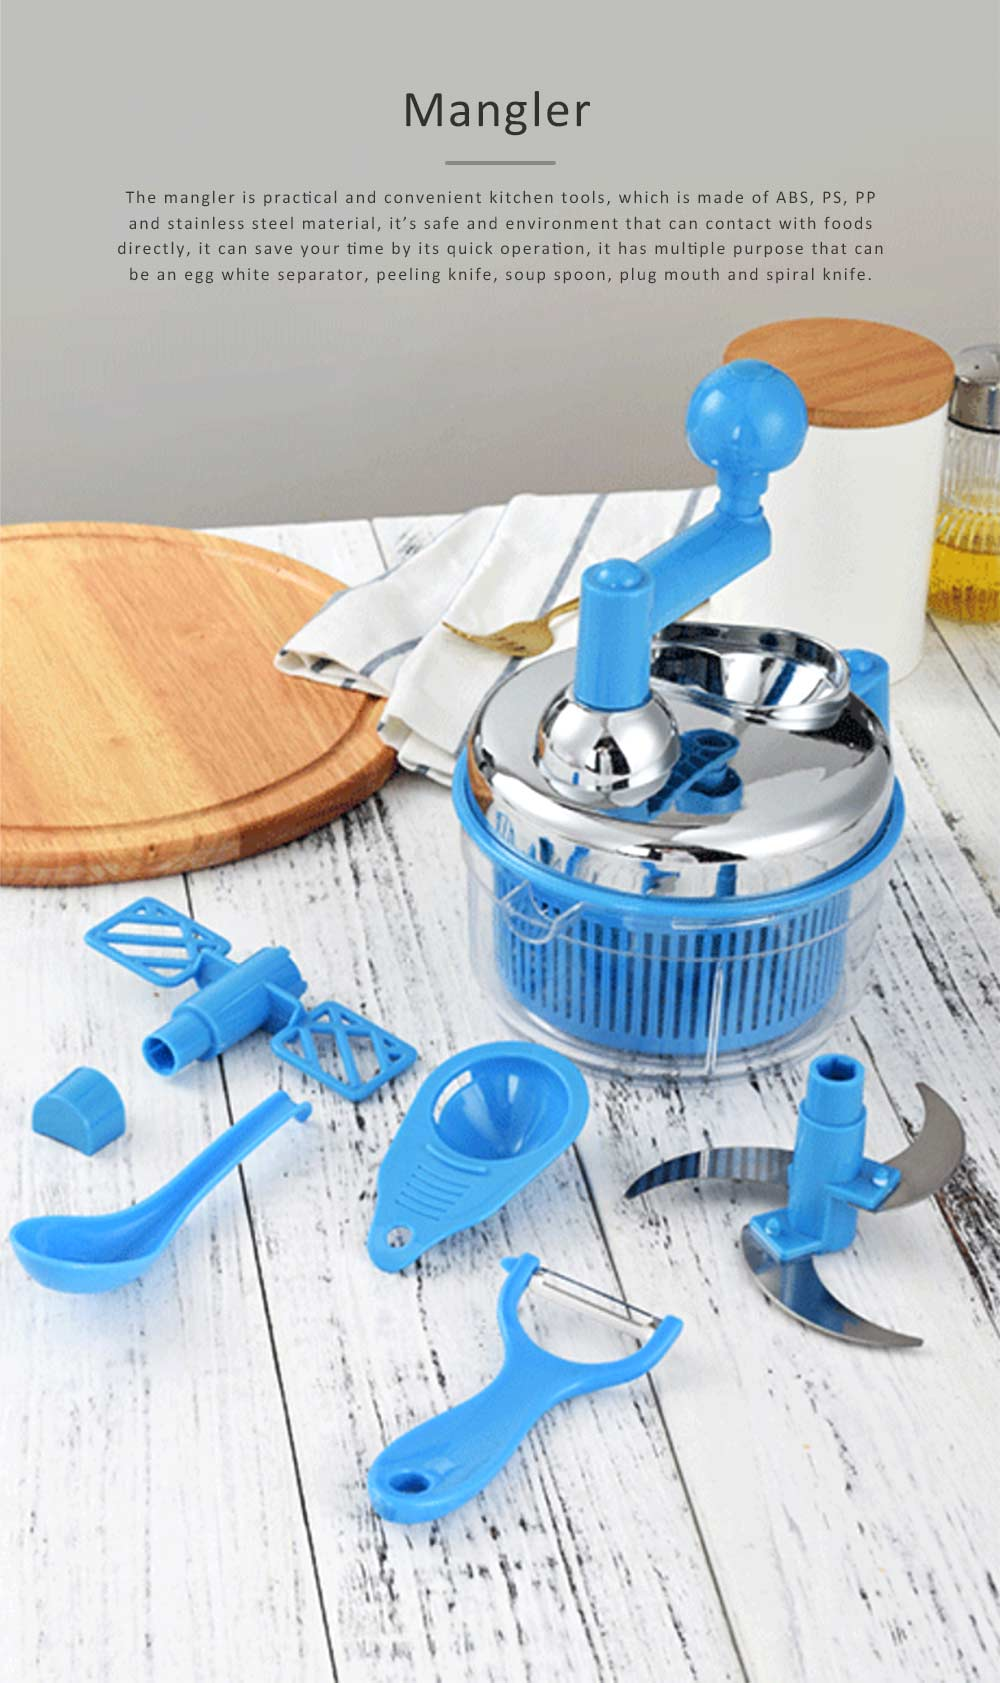 Meat Grinder Stainless Steel ABS Material Practical Slicer for Foods Cutter Multifunctional Mangler 0